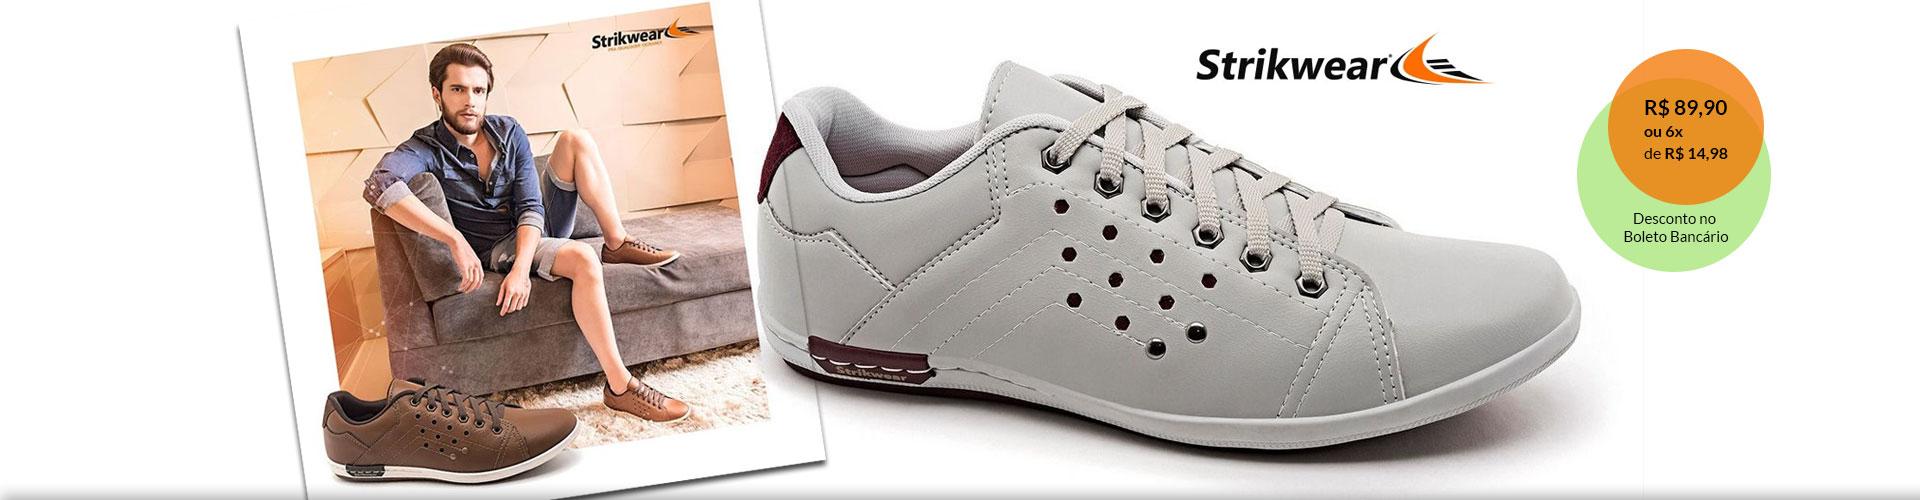 full-sapatenis-masculino-307j-strikwear